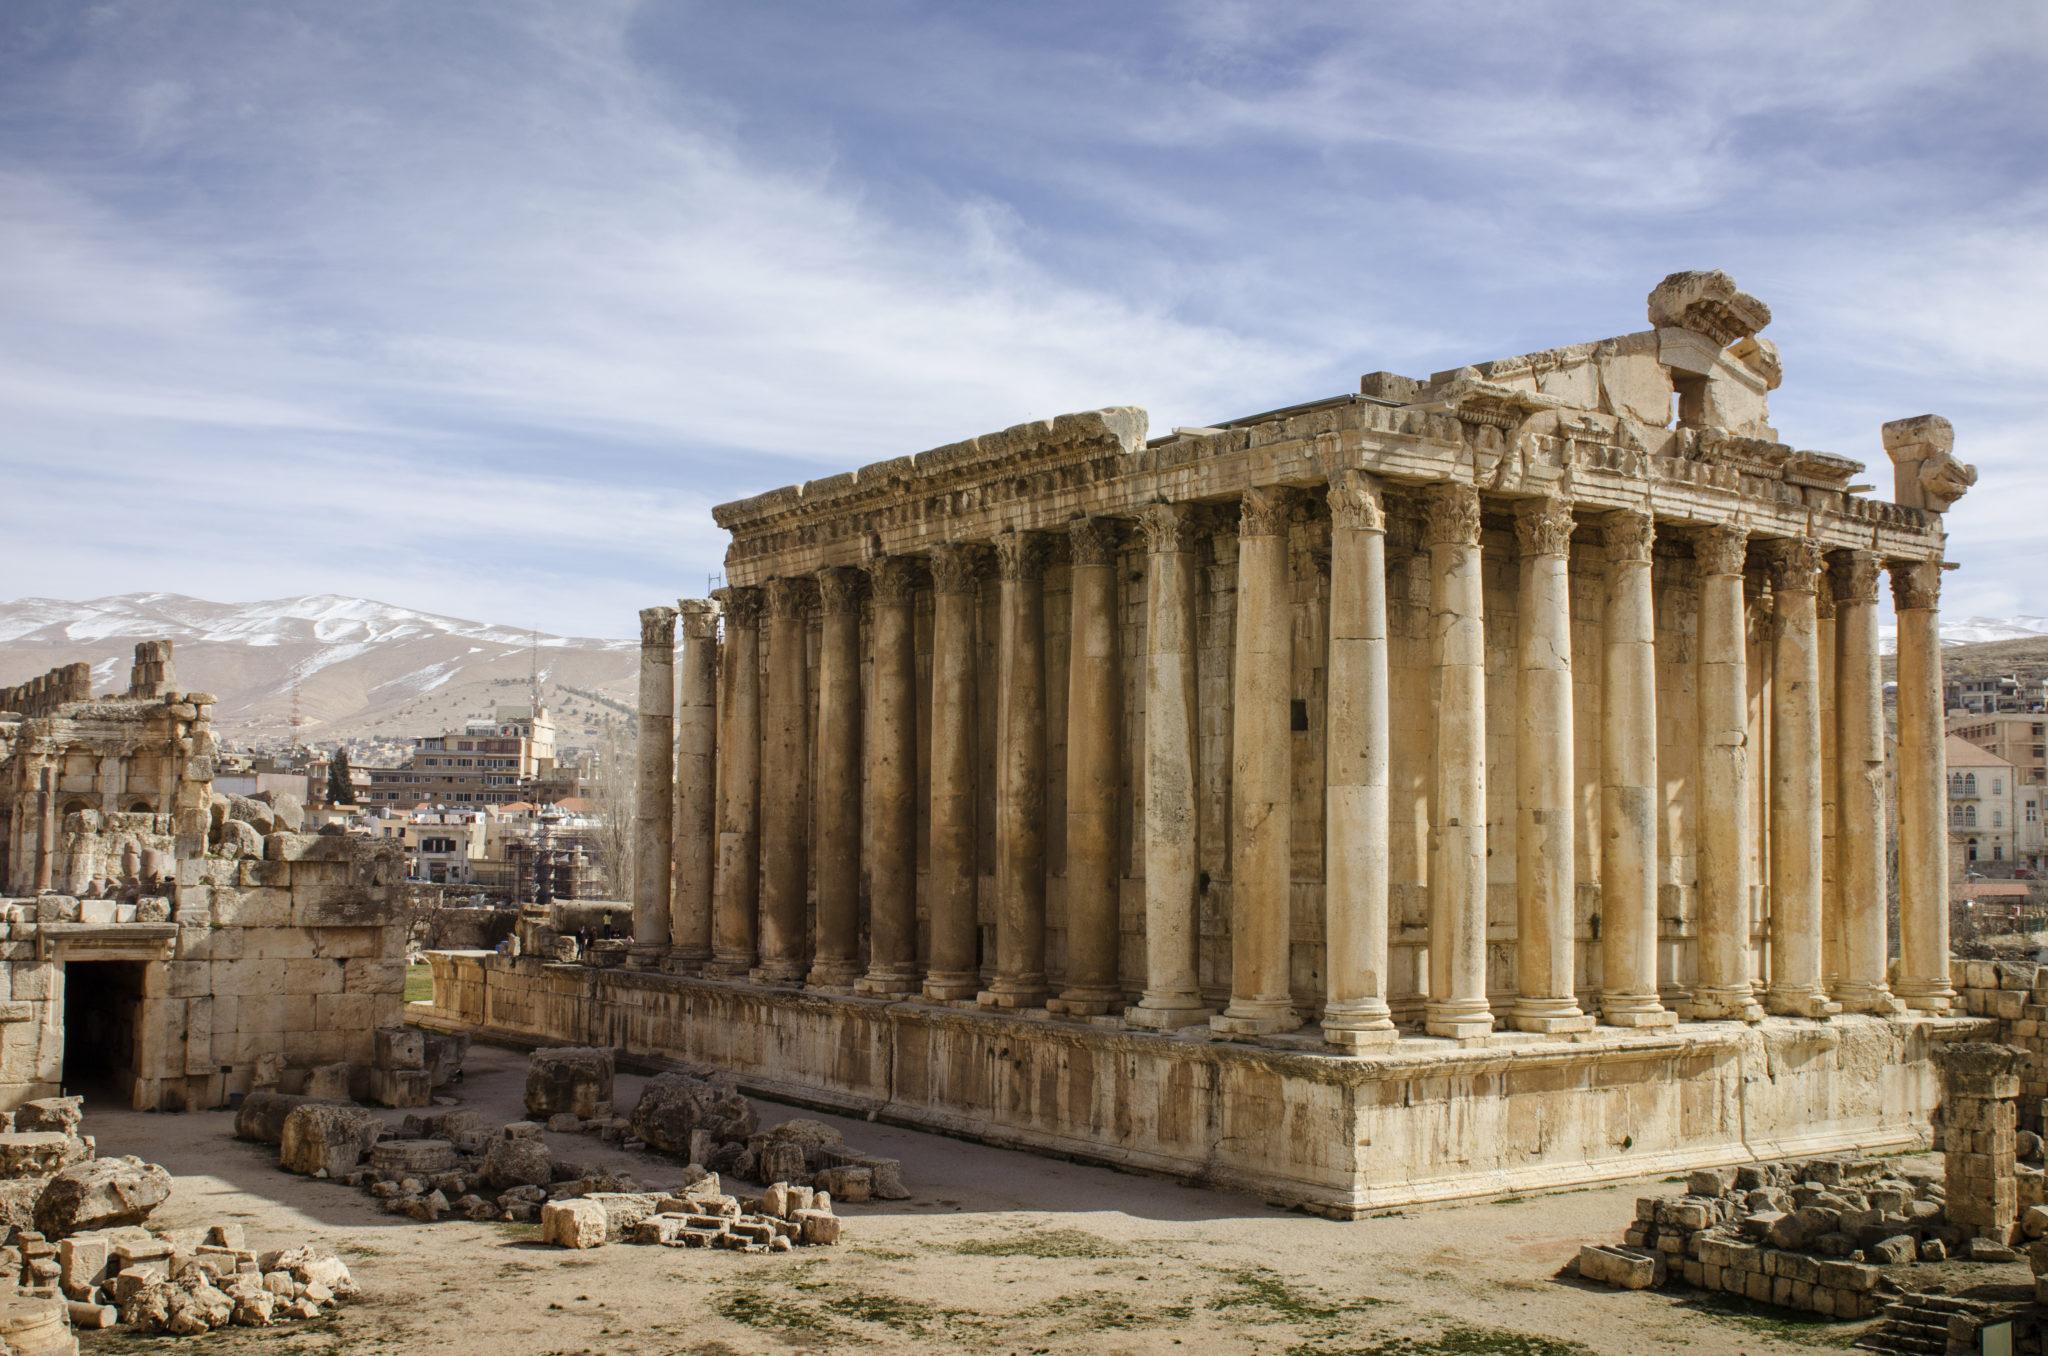 Libanon-Sehenswuerdigkeiten-Baalbek-Bekaa-Ebene